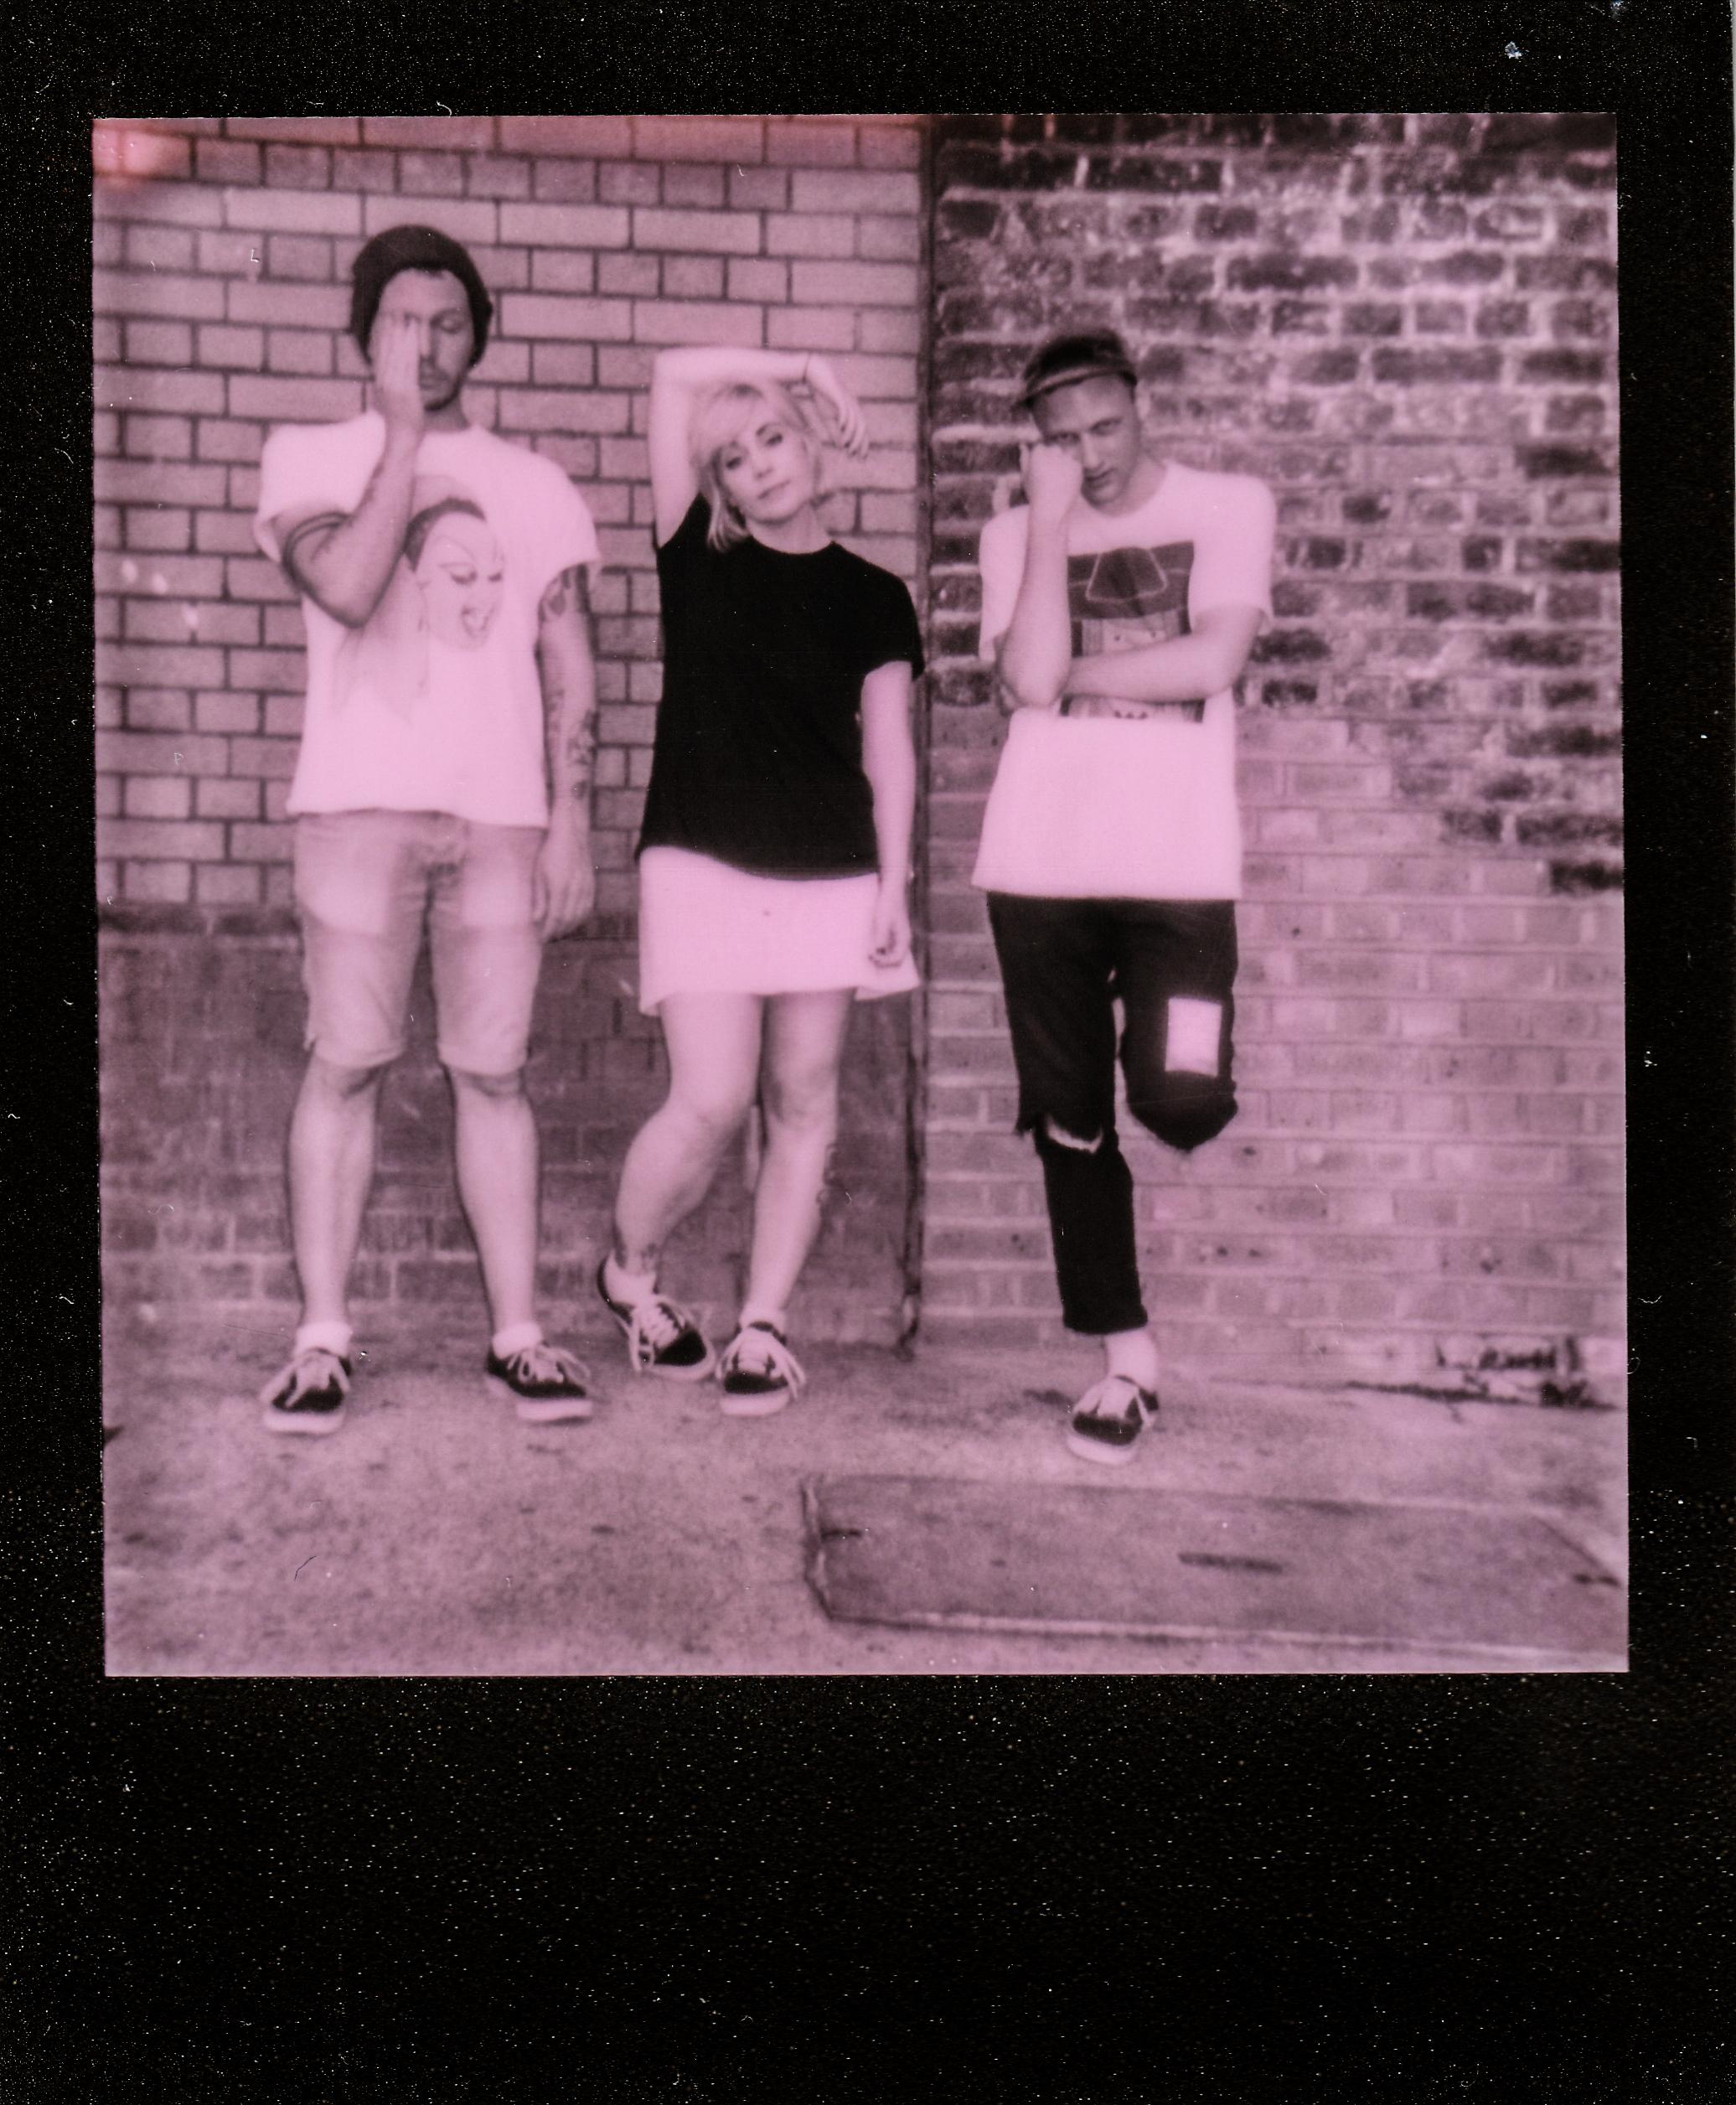 Doe Polaroids - Corsica Studios - 21.06.2017 - Ant Adams-2.jpg